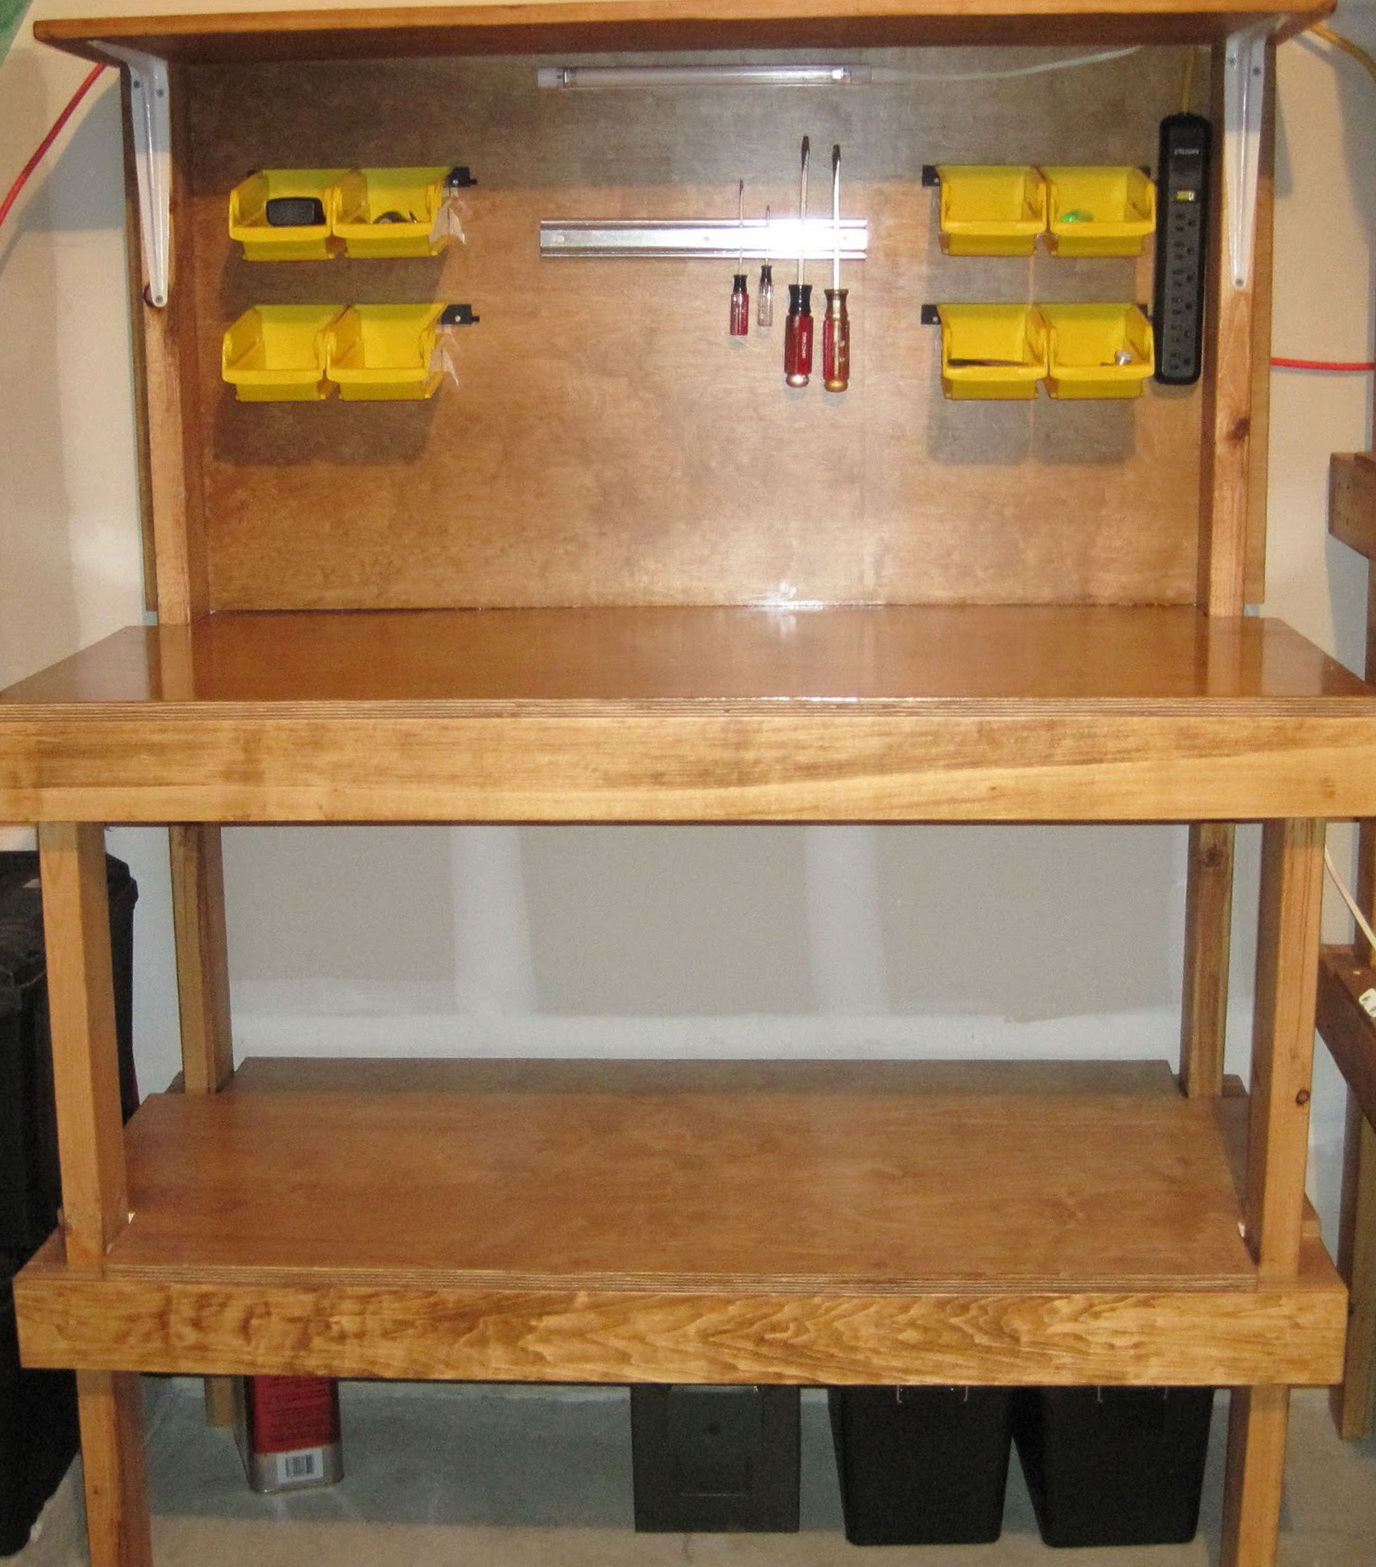 Nrma Reloading Bench Plans Home Design Ideas